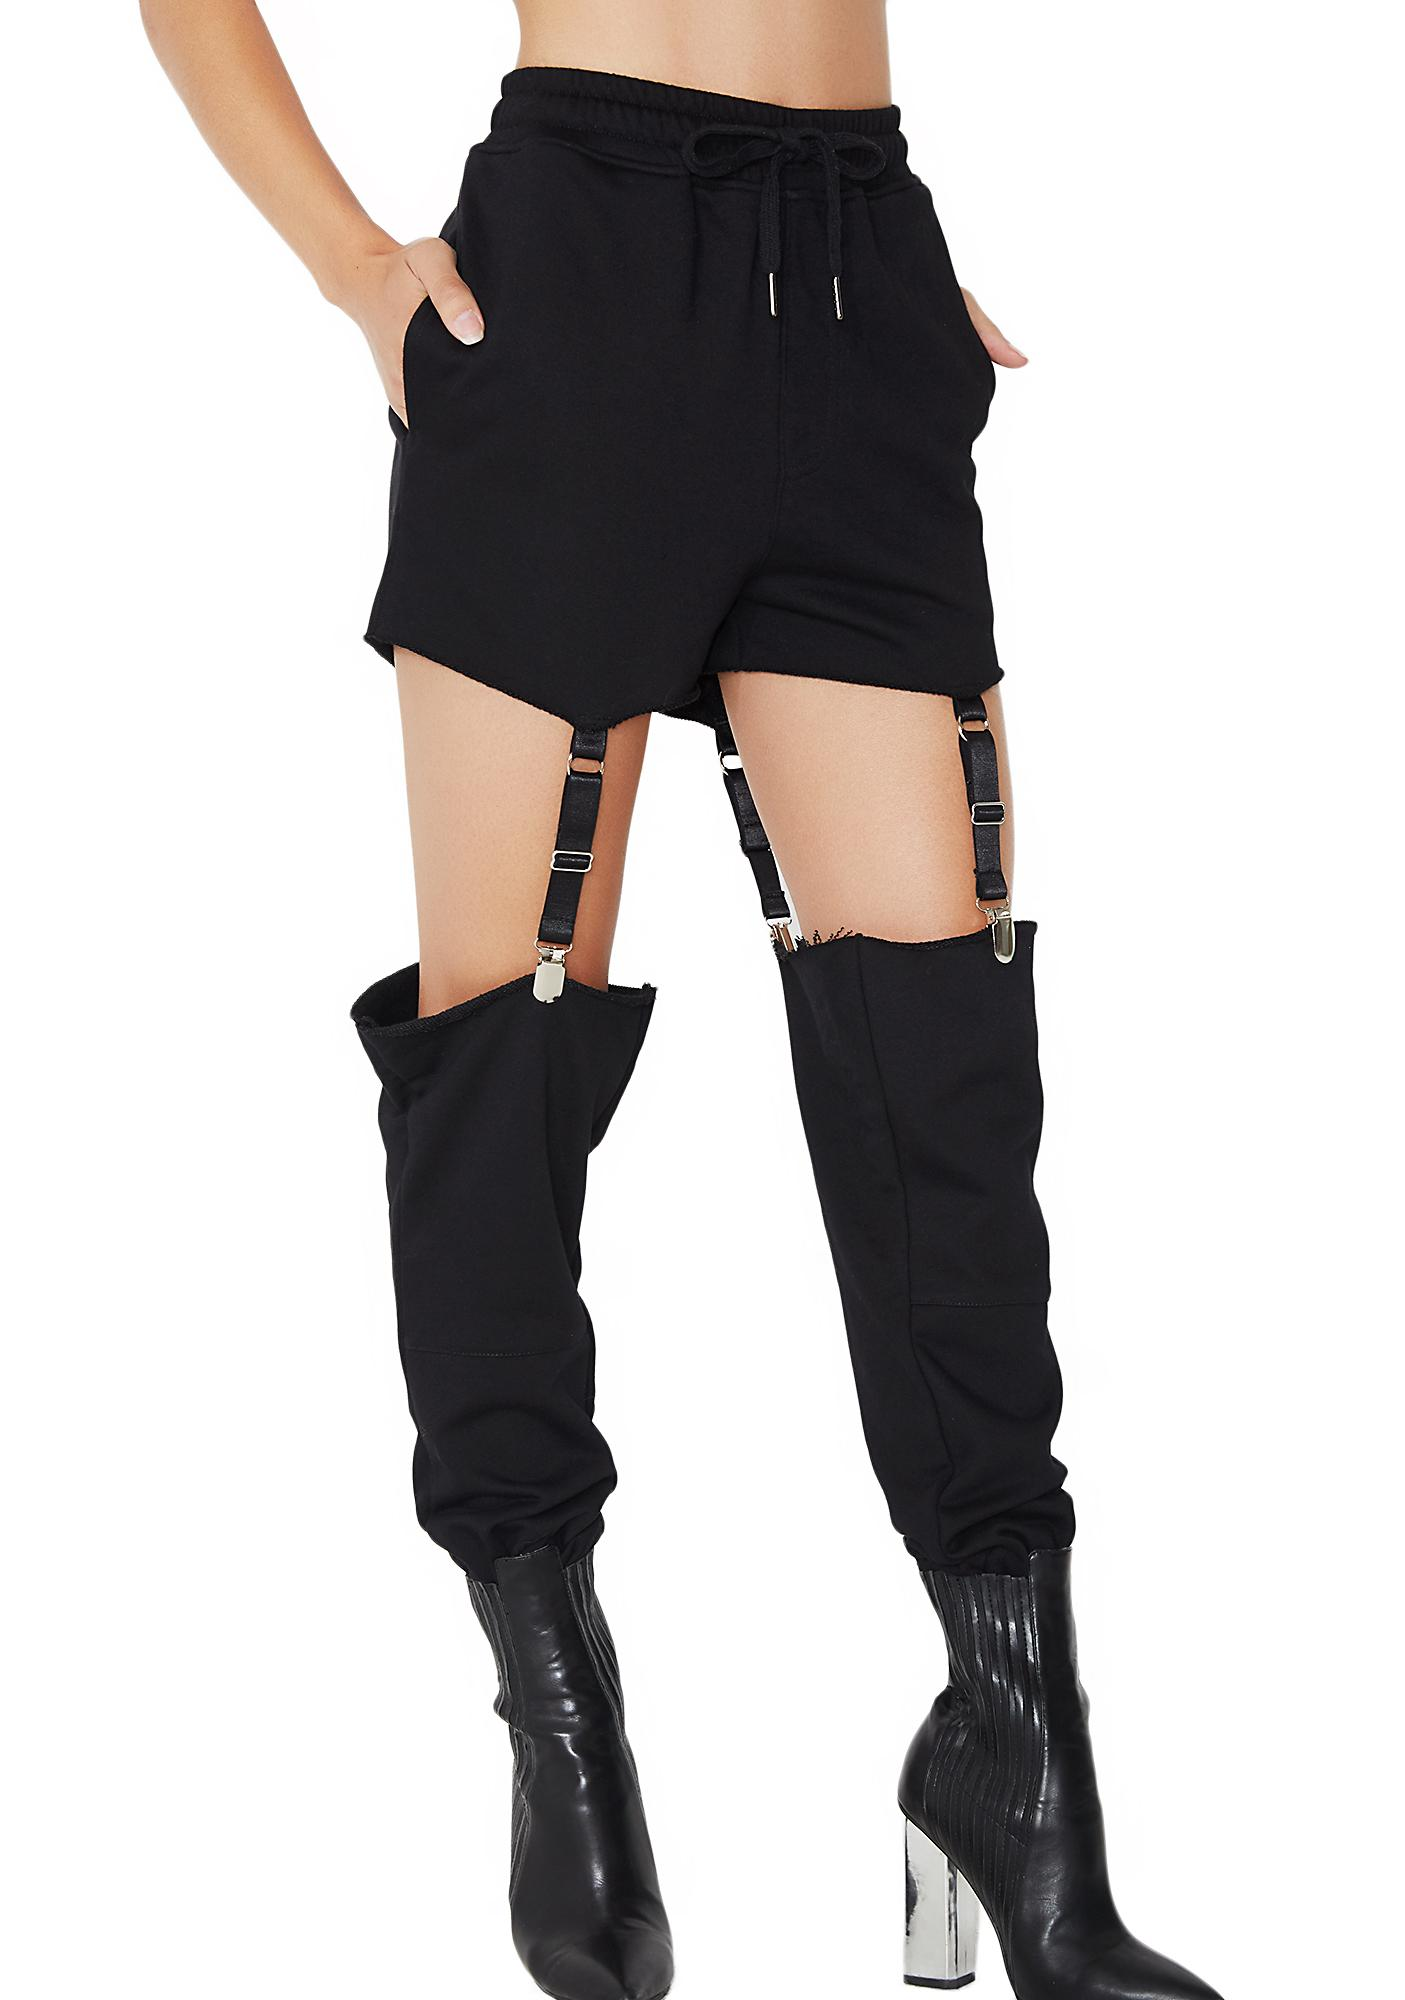 Poster Grl Roulette Suspender Sweatpants